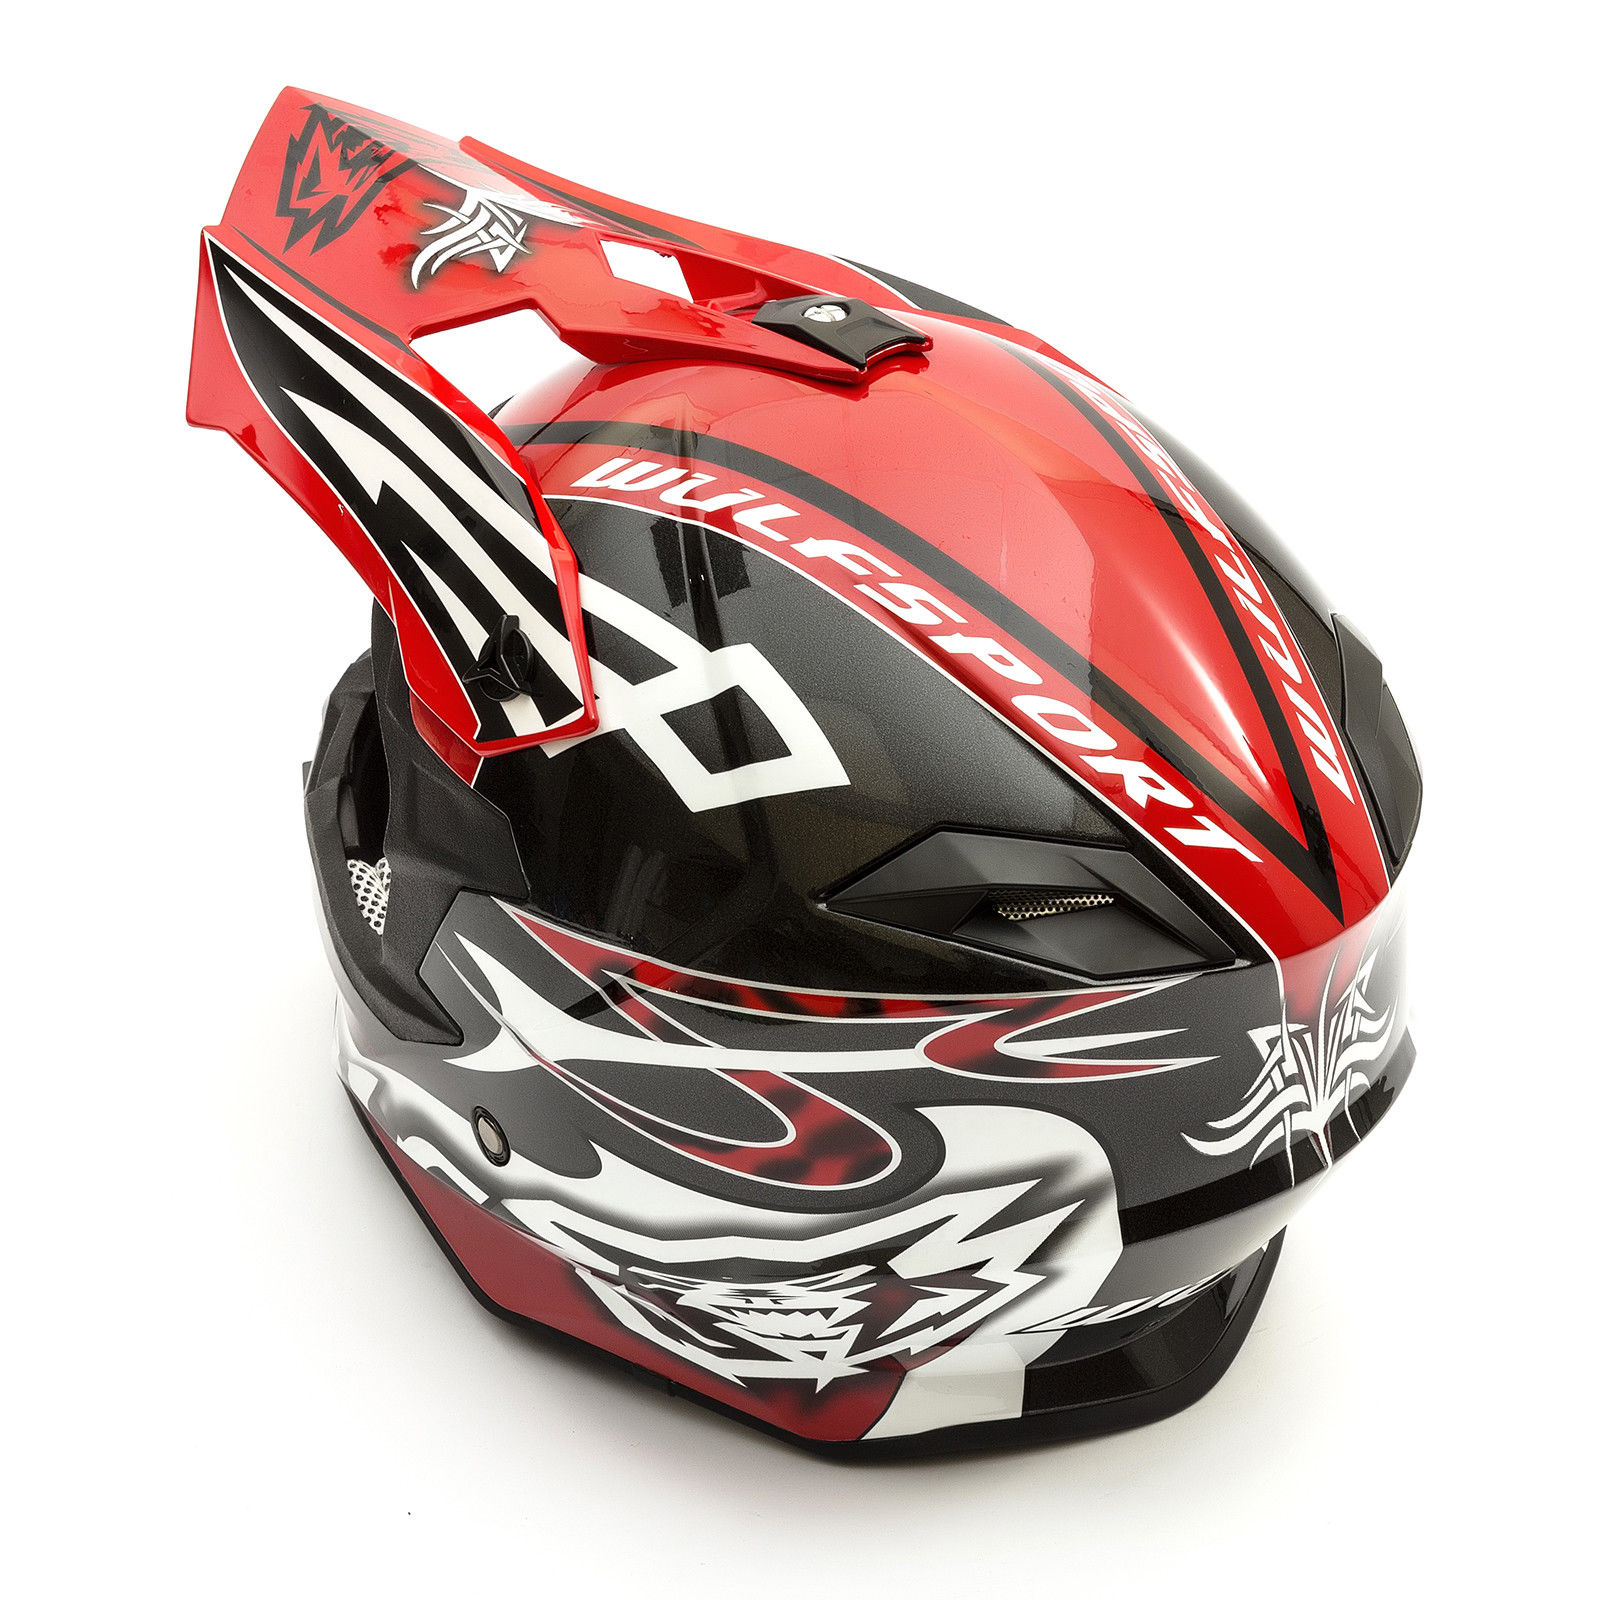 Wulfsport-Adult-Sceptre-Helmets-Motocross-Pitbike-Motorbike-Off-Road-Racing-ATV thumbnail 29